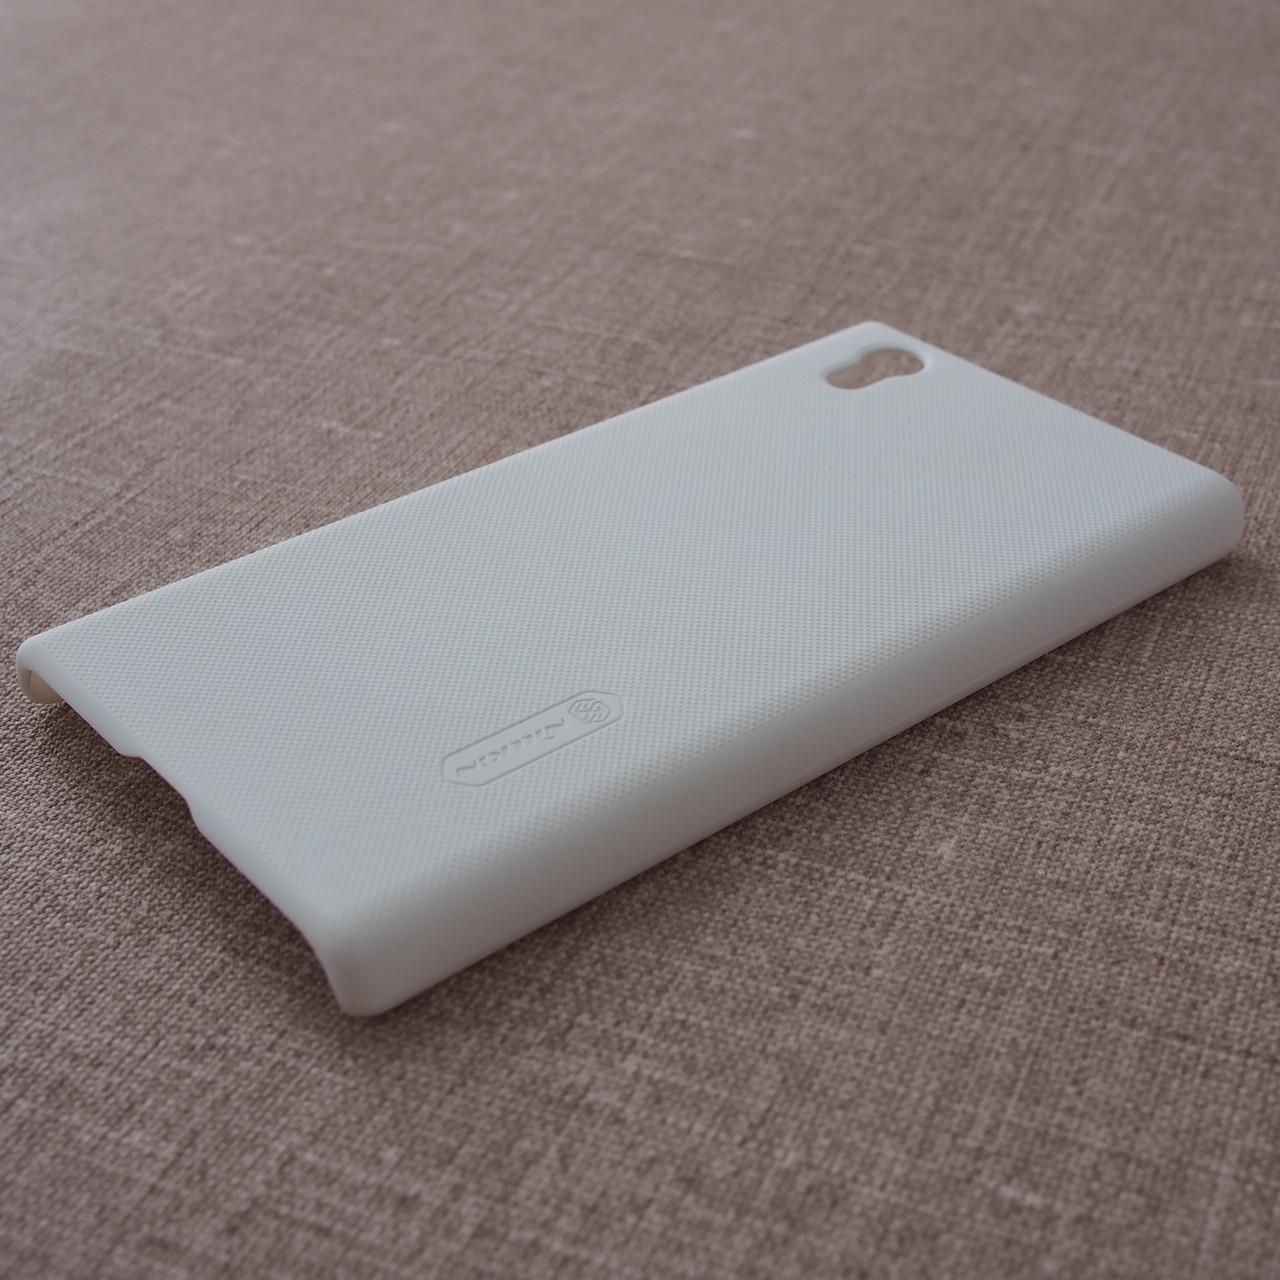 Nillkin Super Frosted Shield Lenovo P70 white